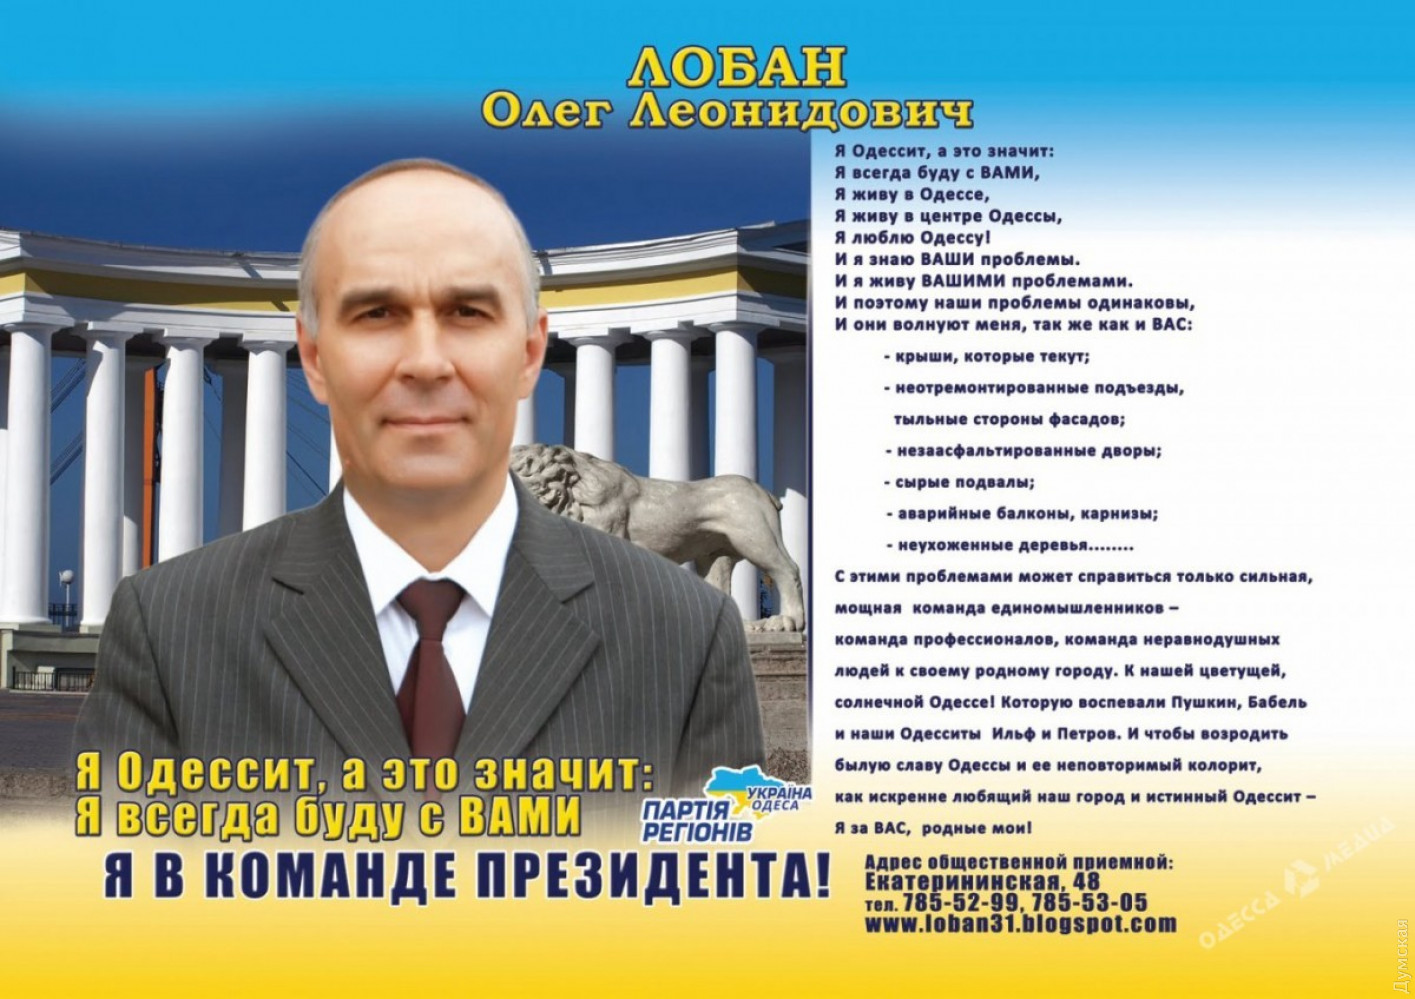 Предвыборная агитация Лобана 2010 года